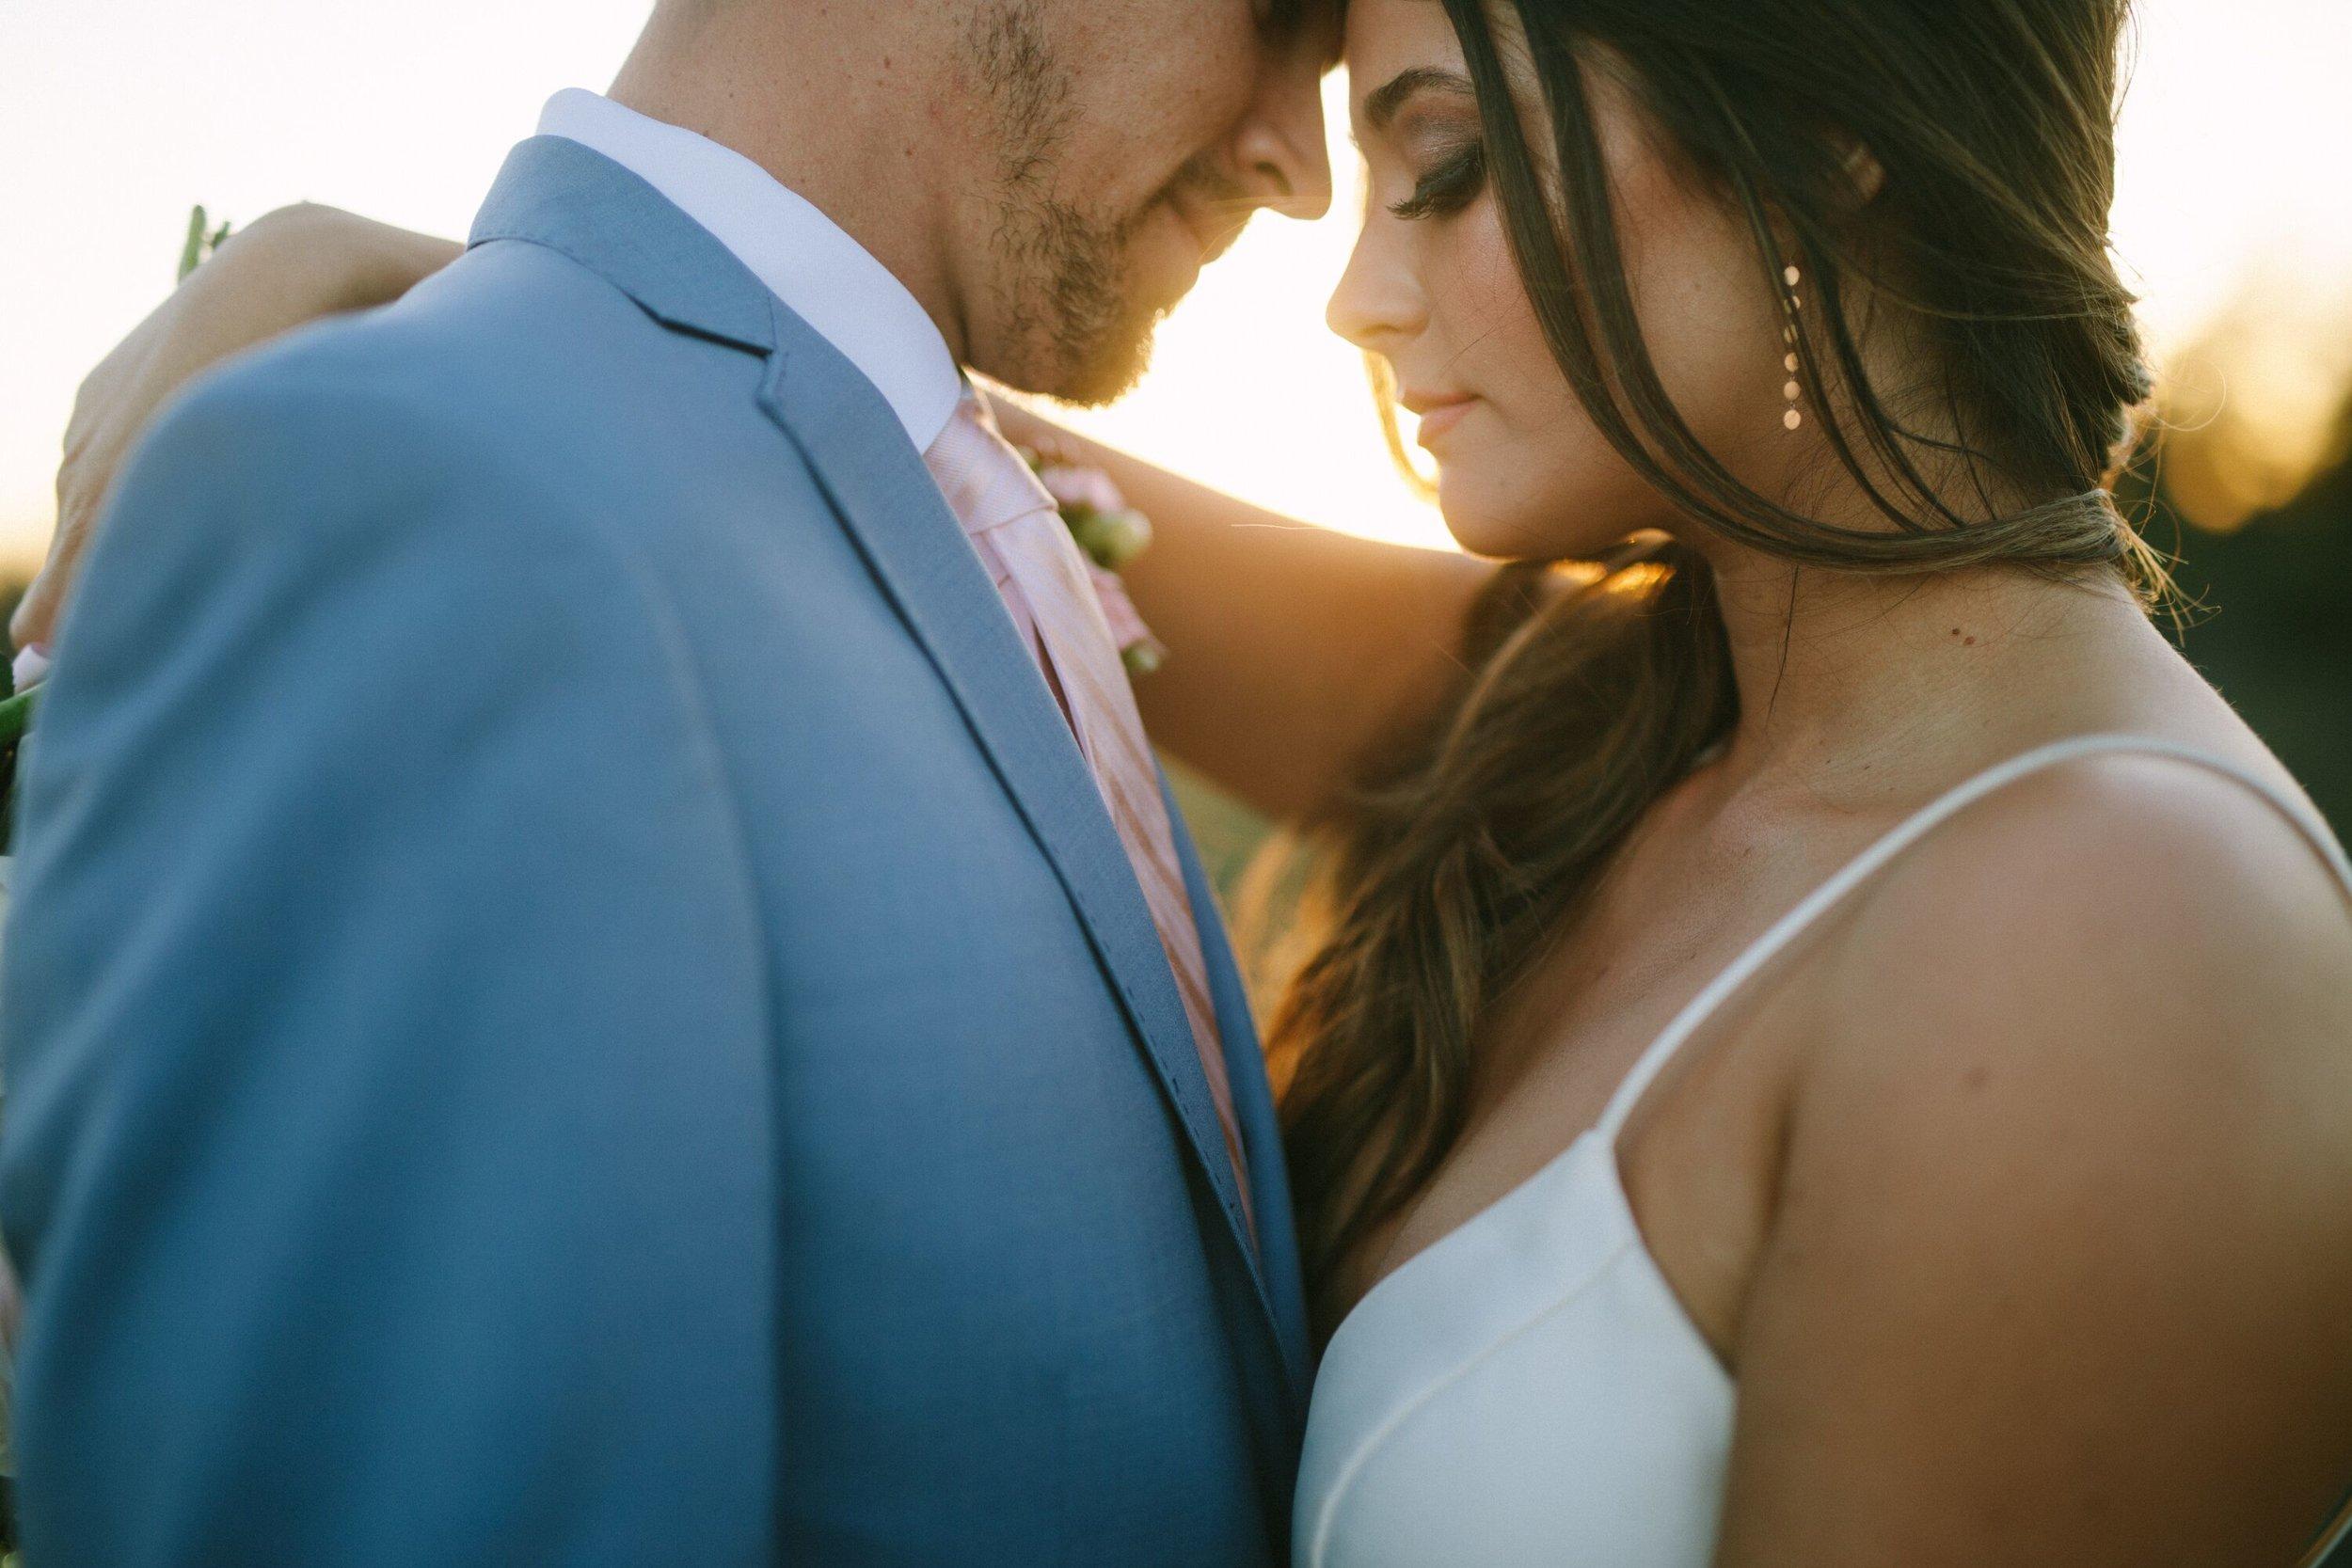 www.santabarbarawedding.com | Photographer: Patrick Ang | Venue: Rancho La Patera & Stow House | Wedding Planner: Elyse Rowen of Elyse Events | Bride and Groom Sunset Closeup